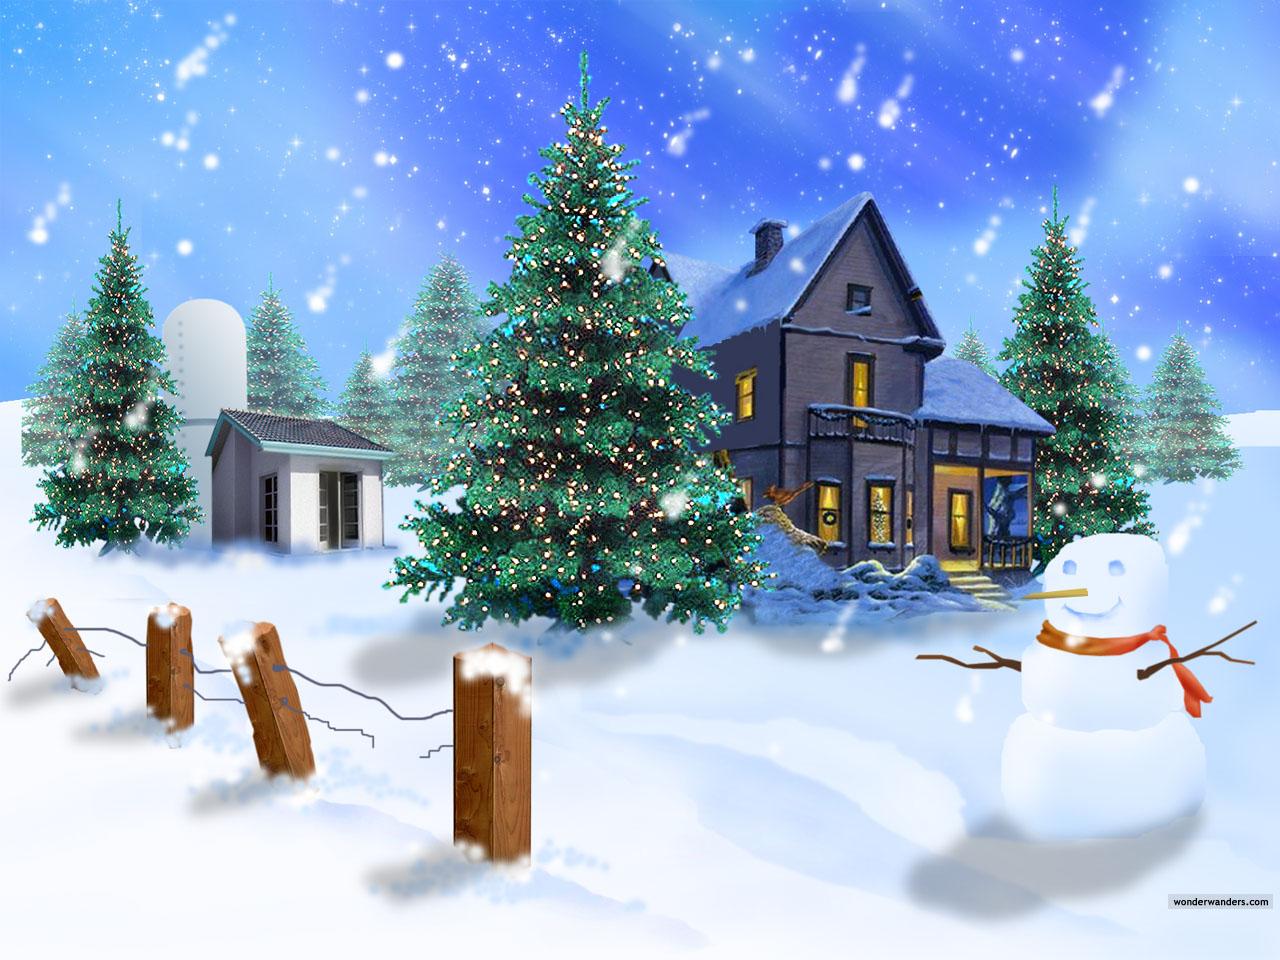 http://4.bp.blogspot.com/_4ScUb_jMfWs/TPIaC4O_z0I/AAAAAAAAAAc/3-O-X7s_TCw/s1600/christmas_wallpaper1.jpg